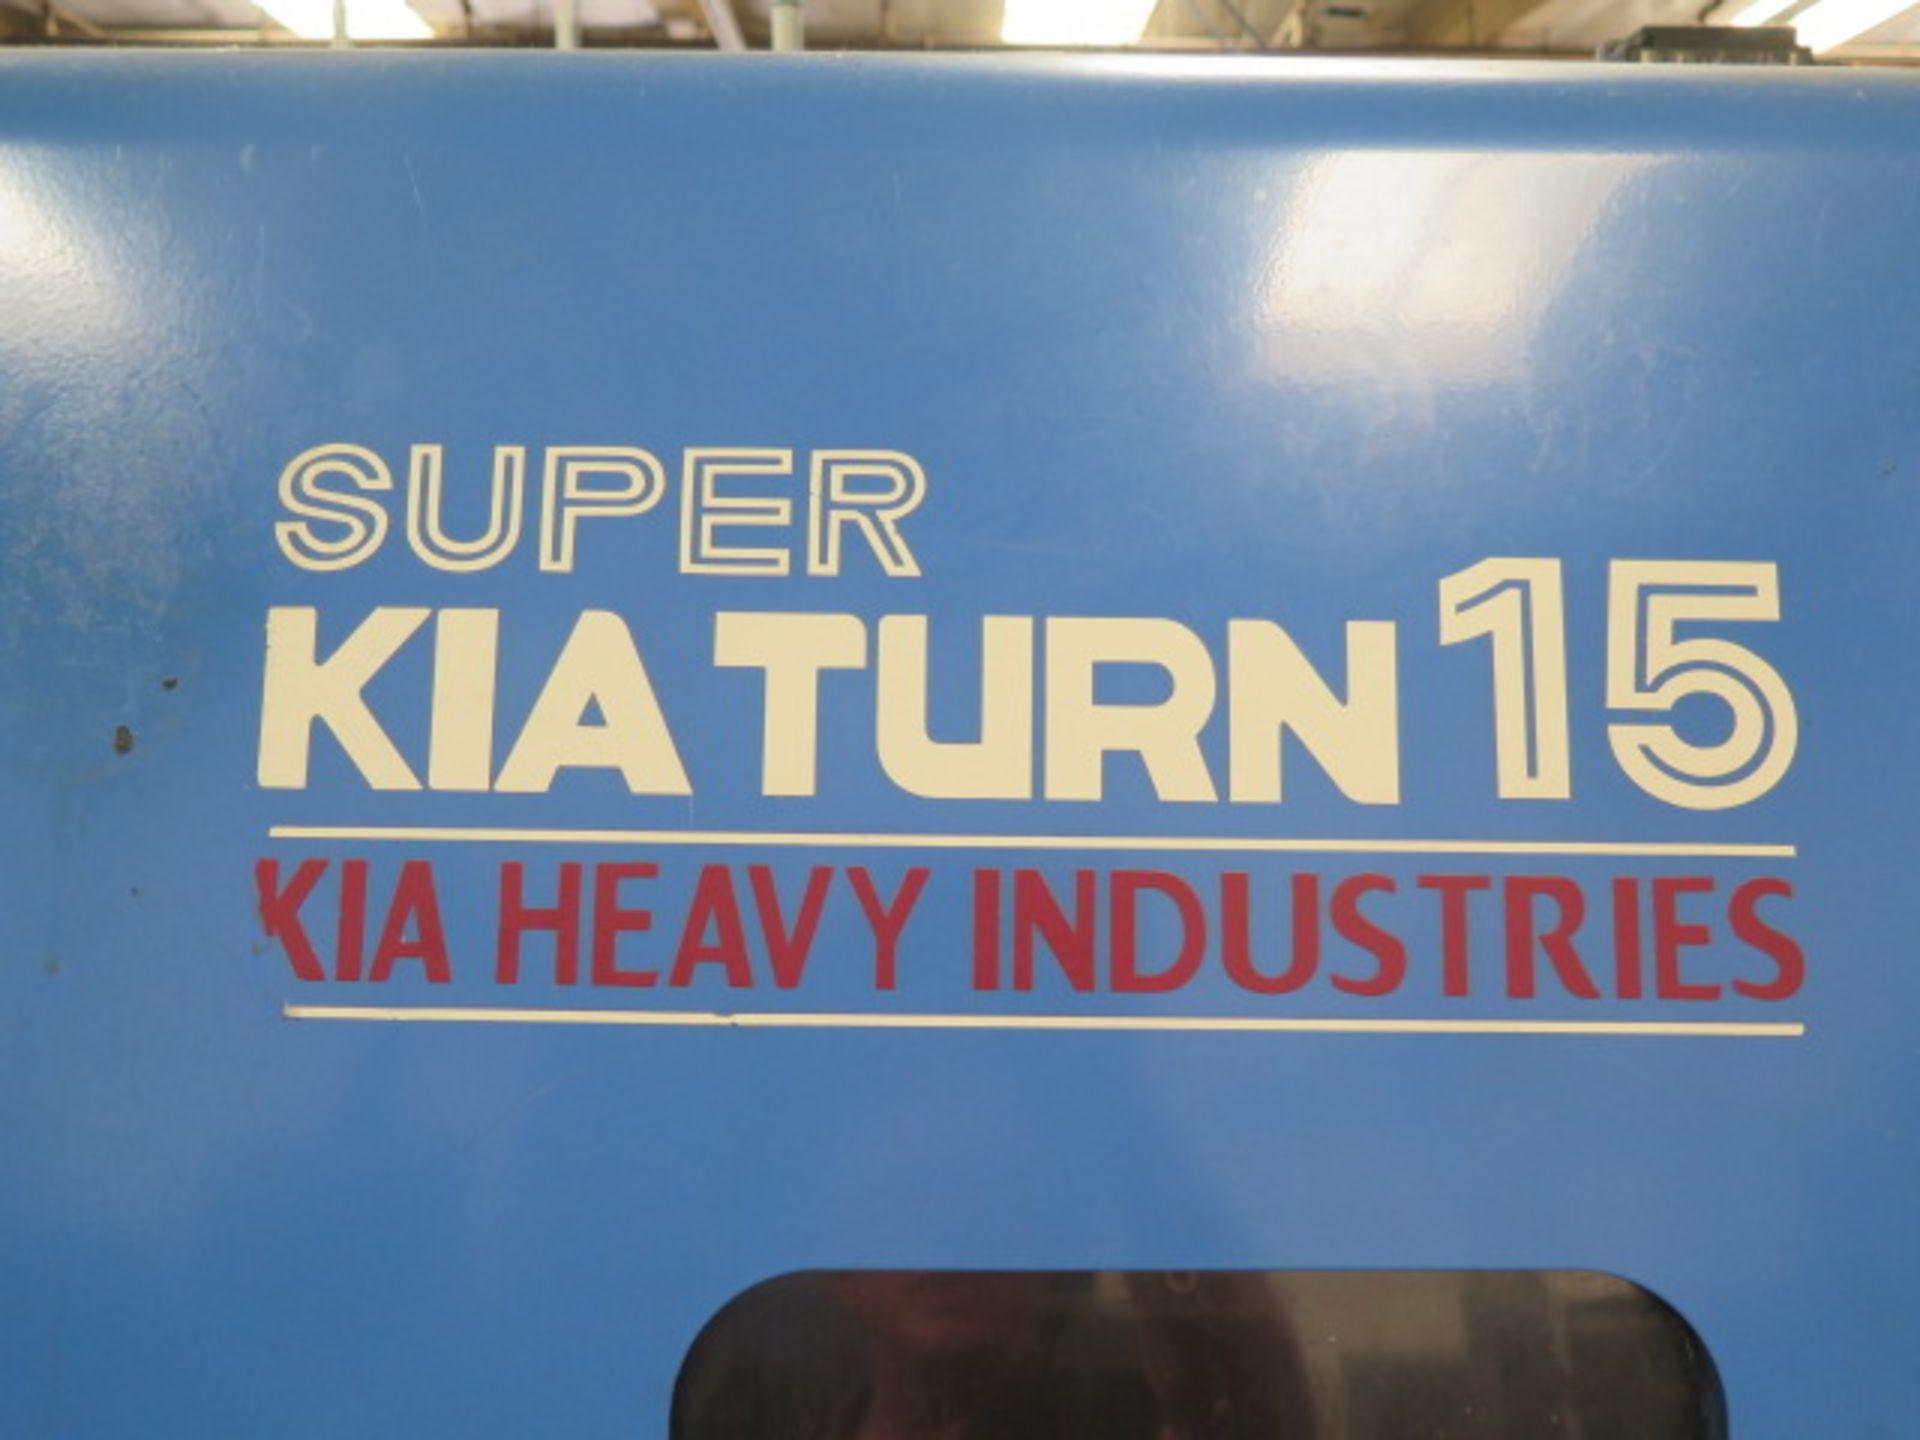 2004 Kia Super KIA Turn 15 CNC Turning Center s/n SKT150905 w/ Fanuc Series 0i-TB Contrs, SOLD AS IS - Image 4 of 16